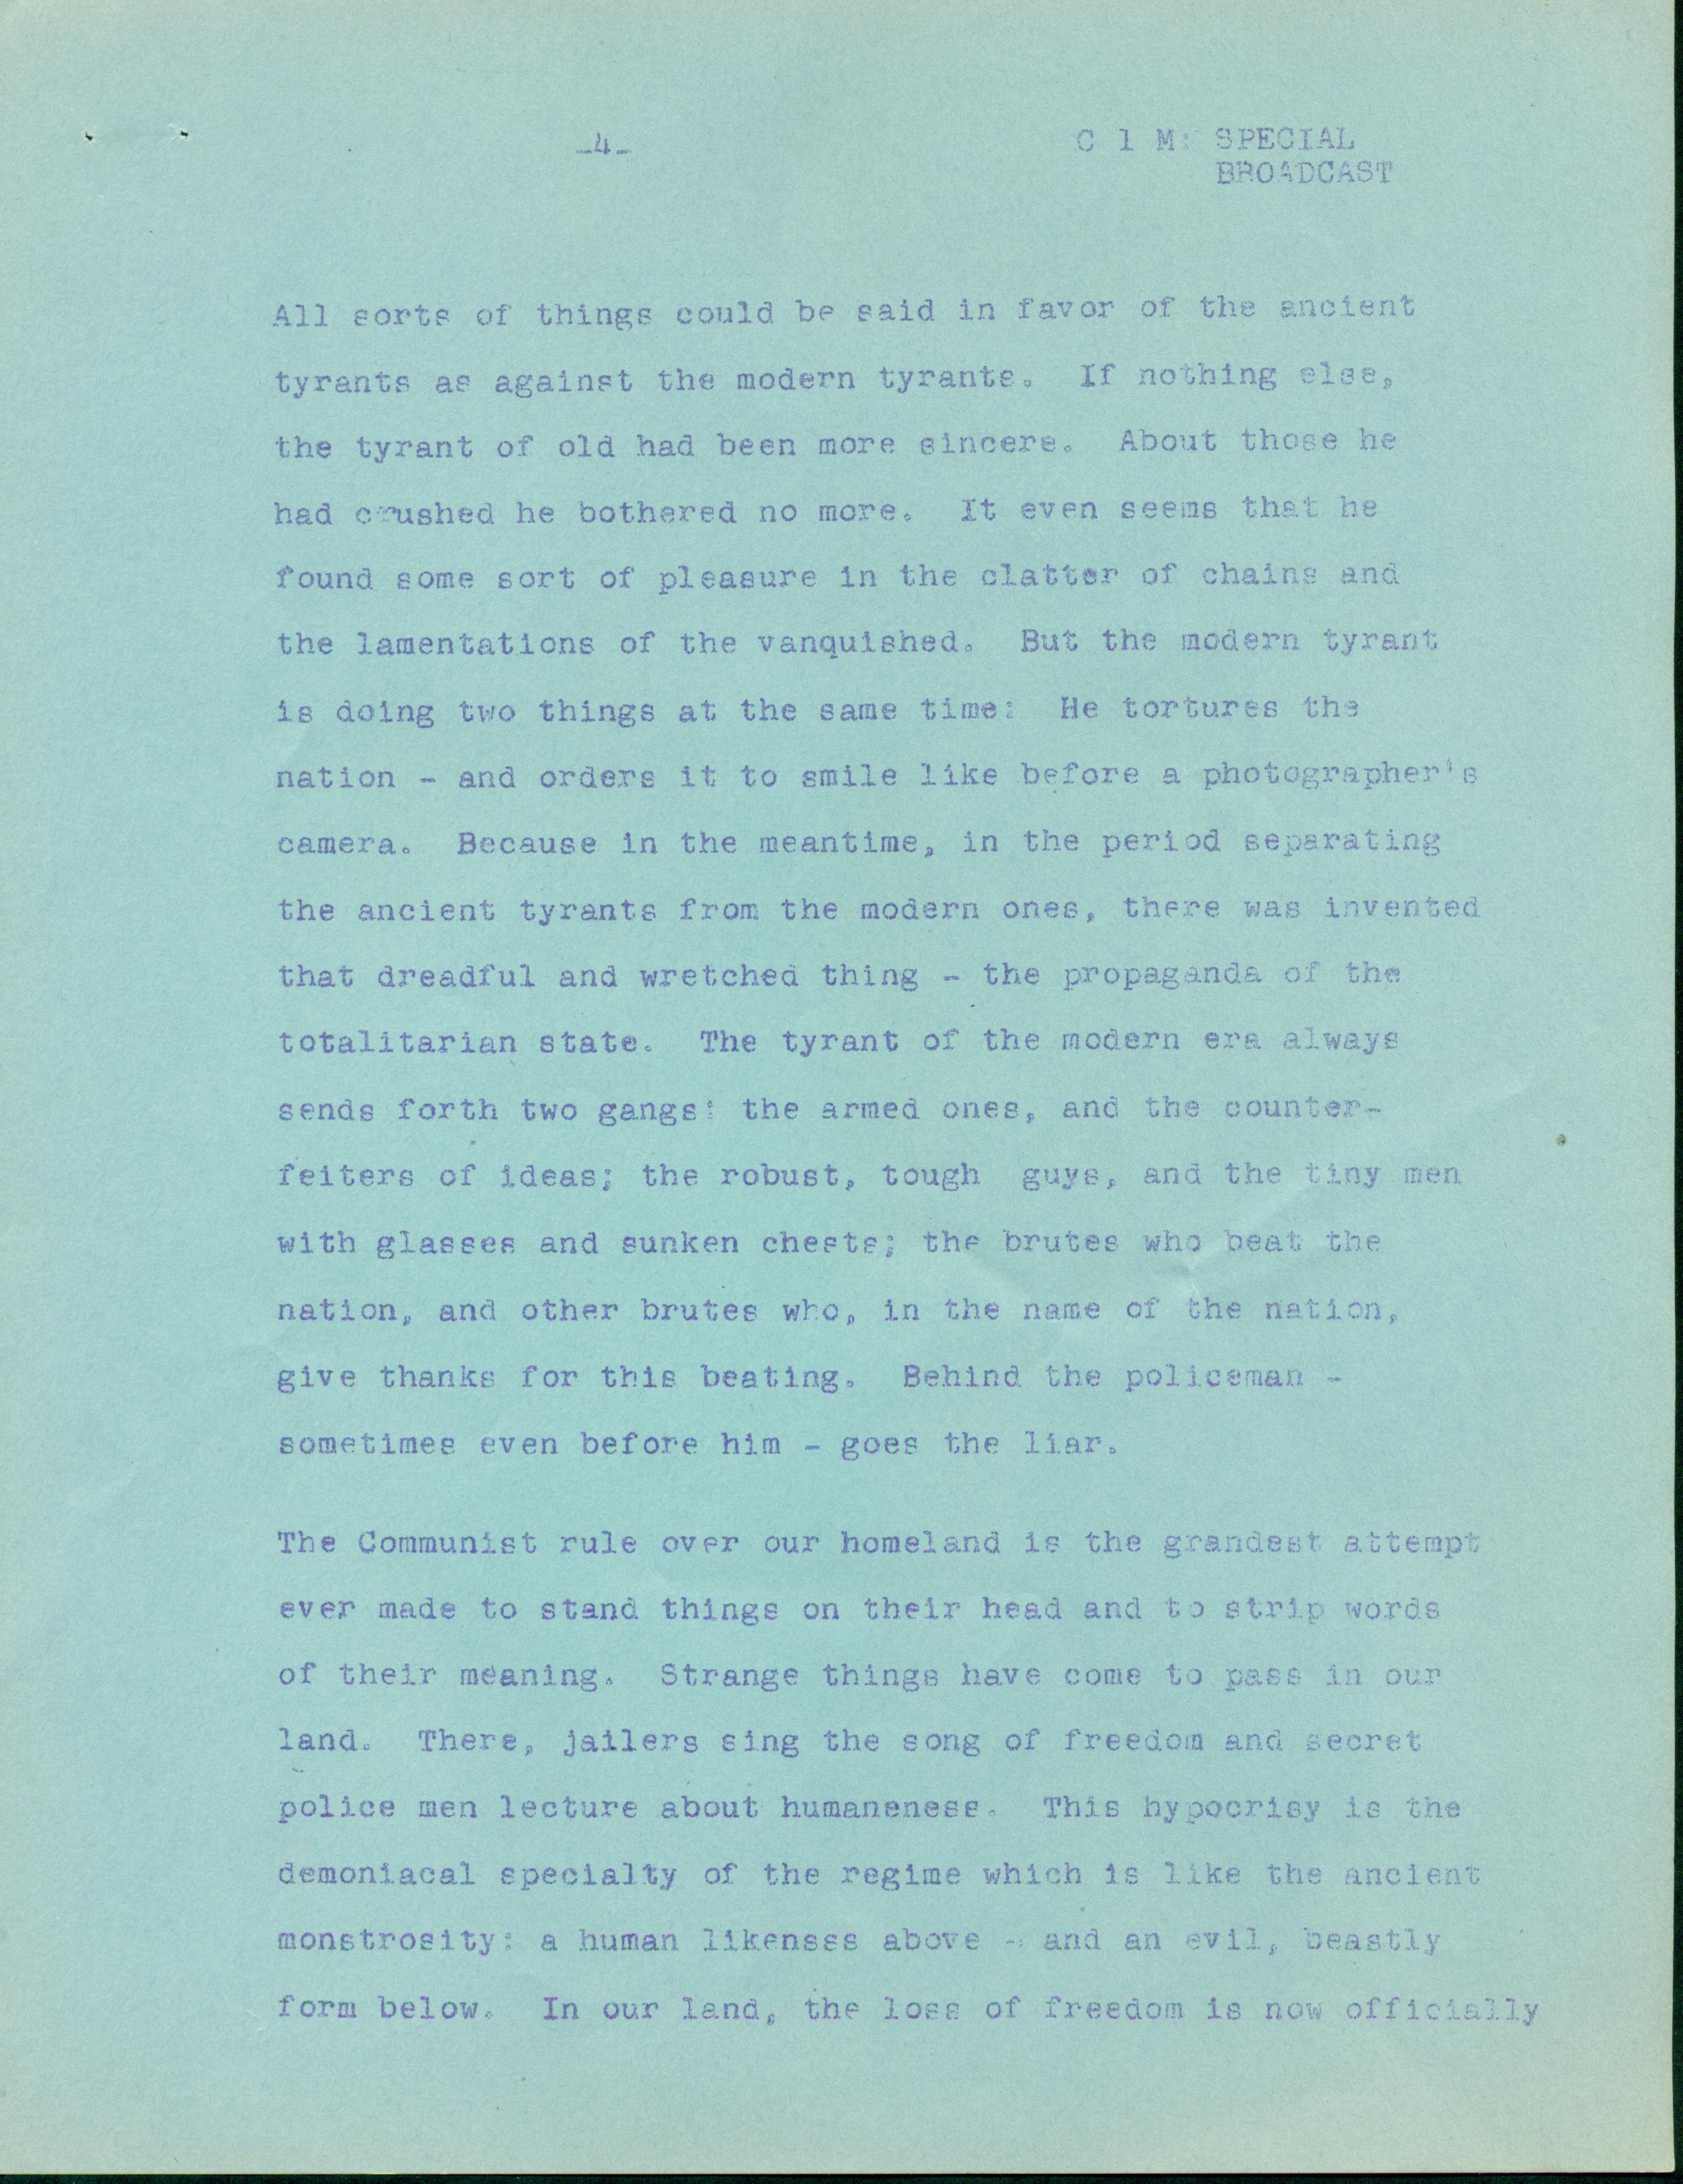 Peroutka, Ferdinand. Inaugural Speech in the RFE, 1951